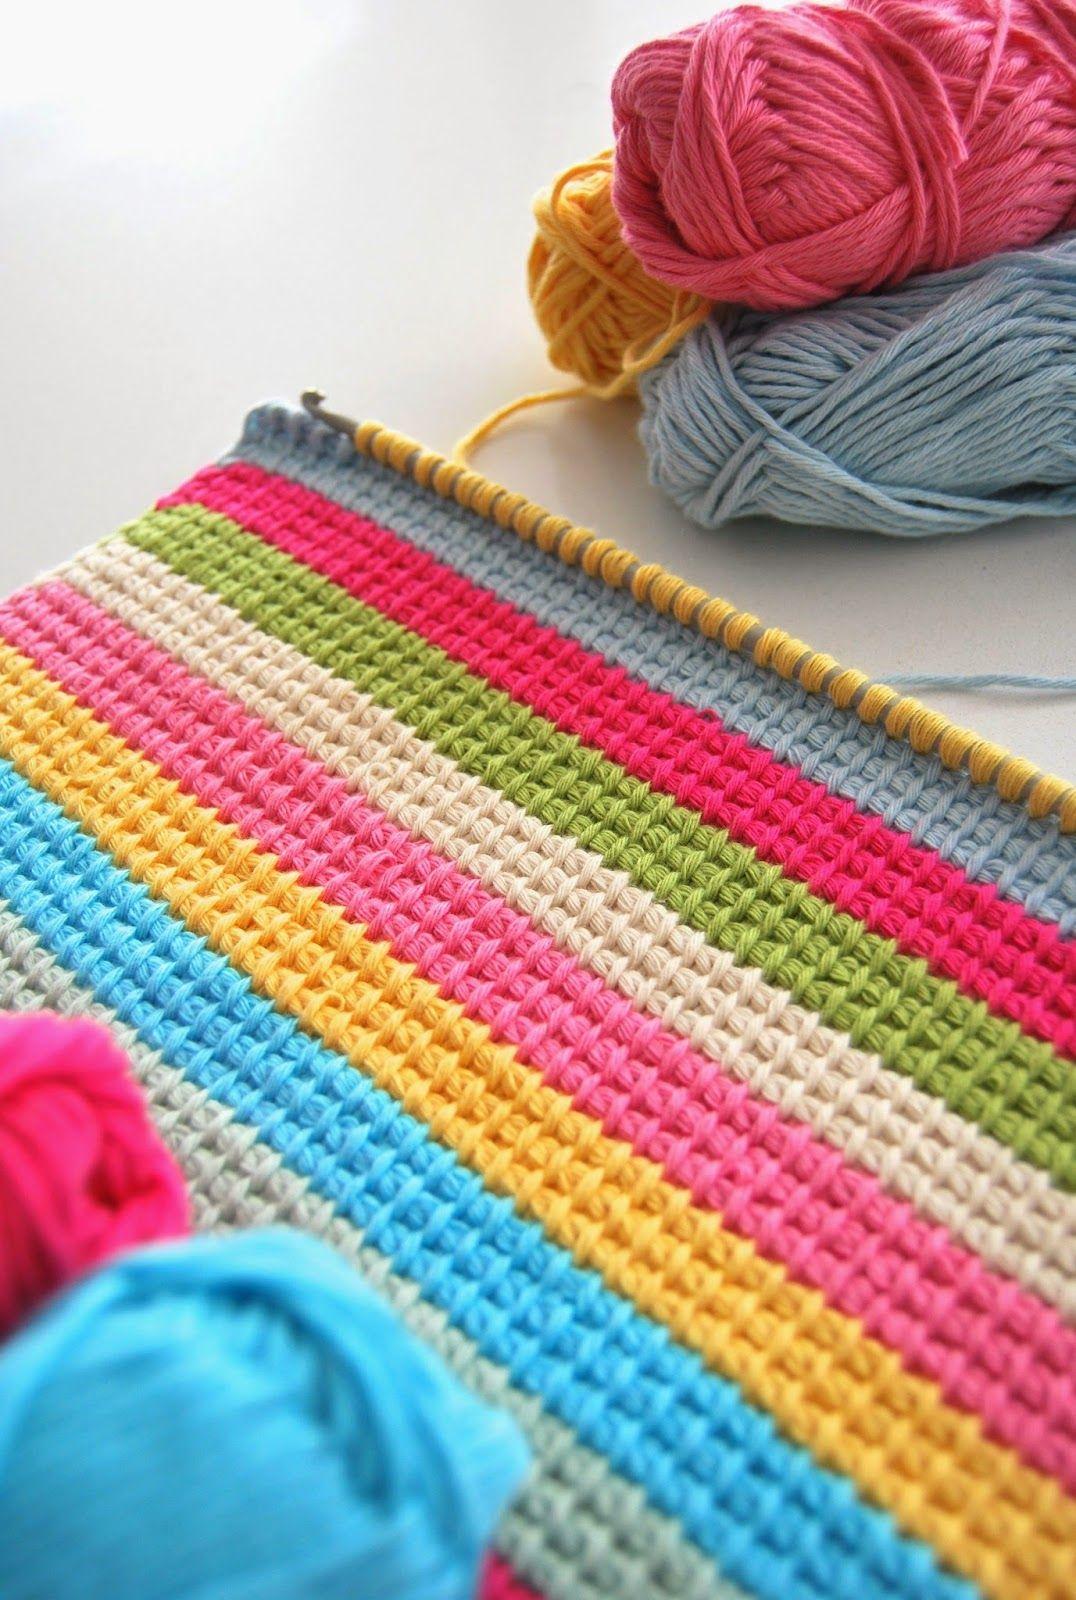 Pin de Gokce Atabeyoglu en Crochet | Pinterest | Tejido, Manta y ...